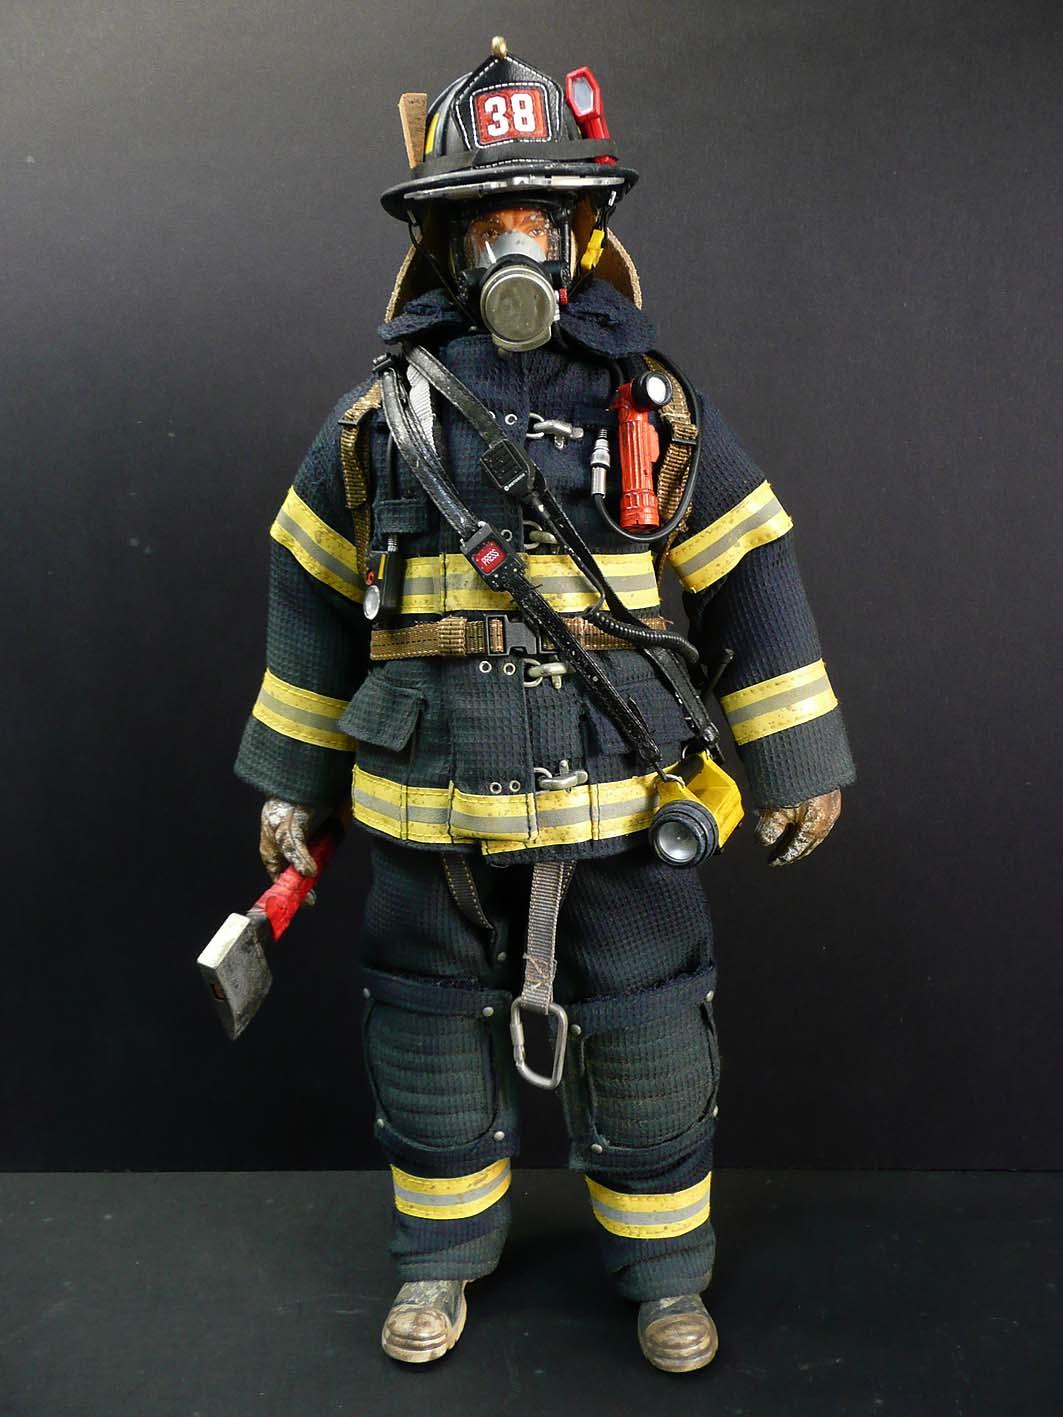 Firefighter Wallpaper For Cell Phone Real Firefighter